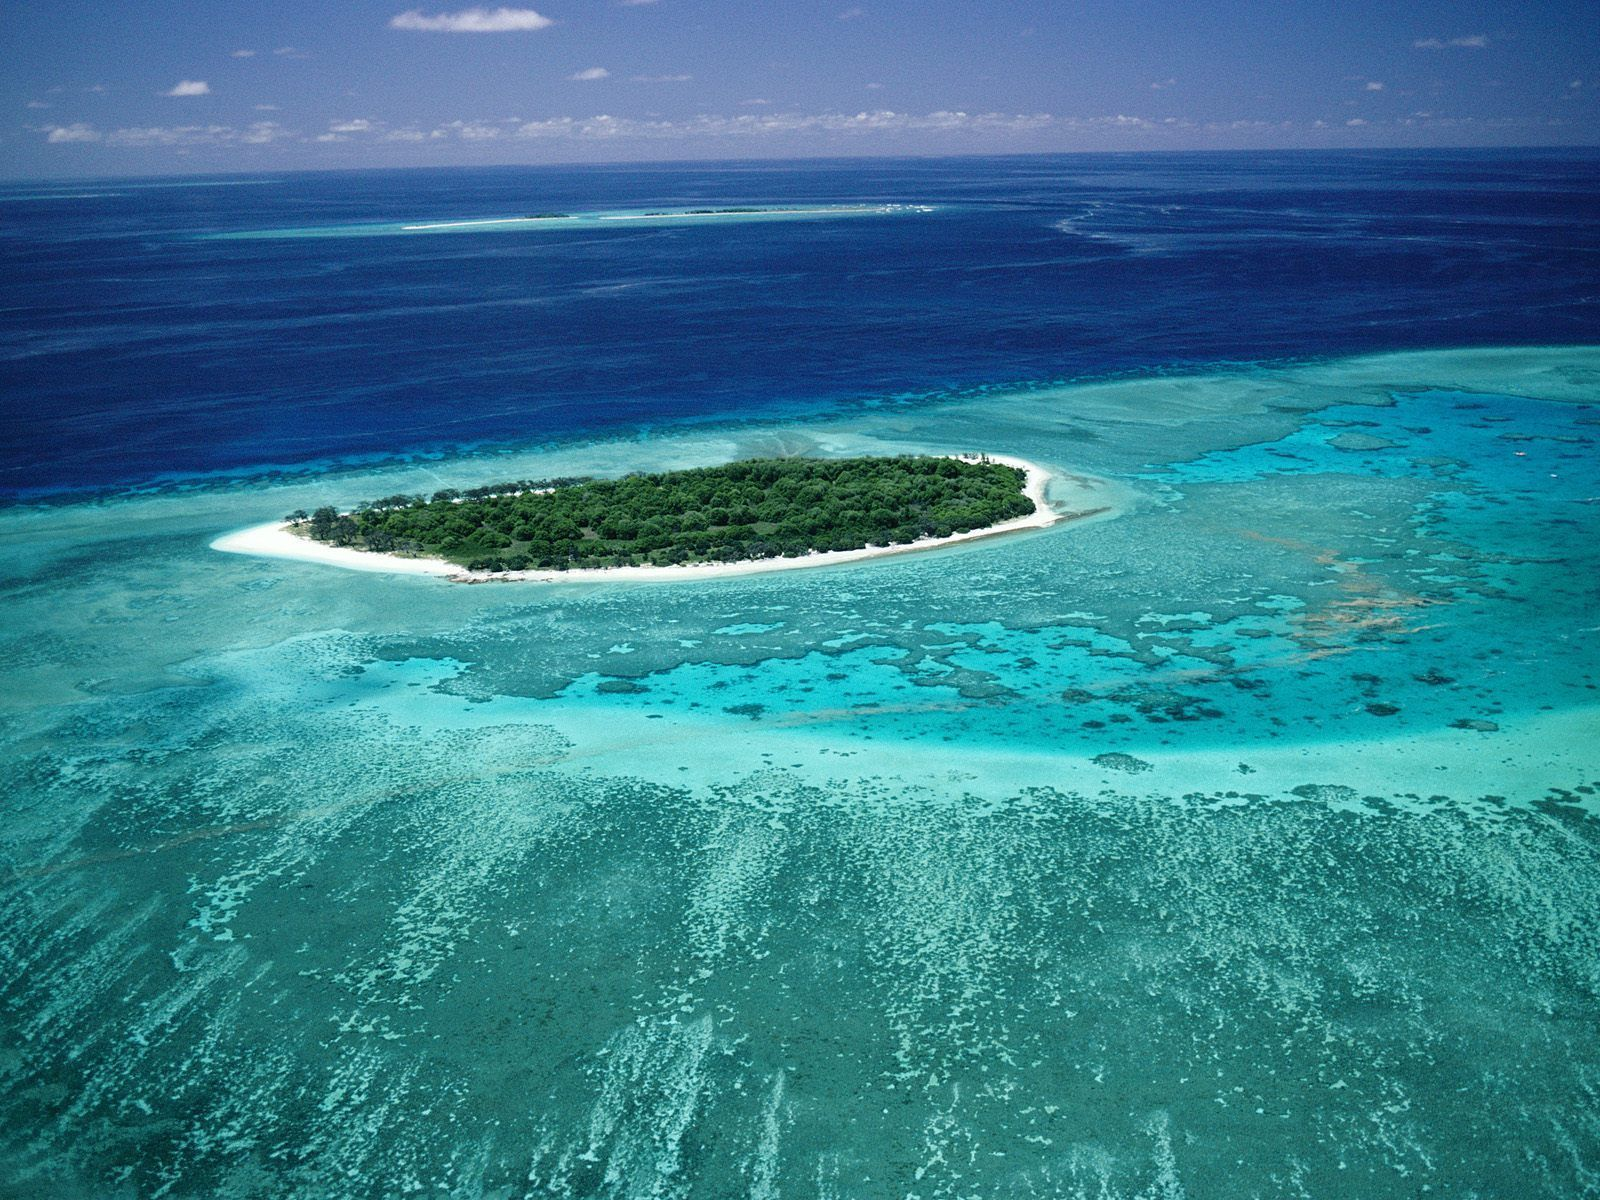 ... : Natural Wonders Great Barrier Reef, Australia World Heritage Site